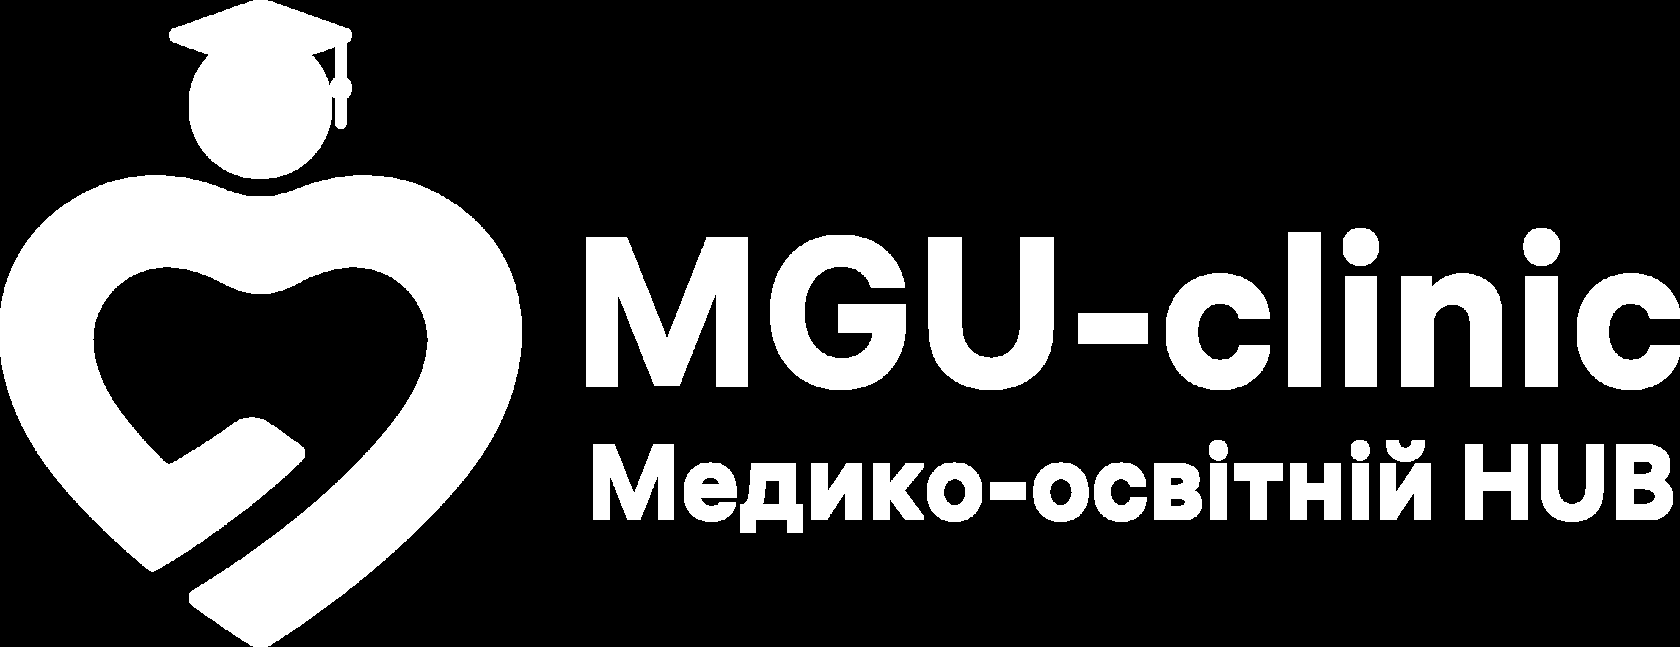 MGU-clinic